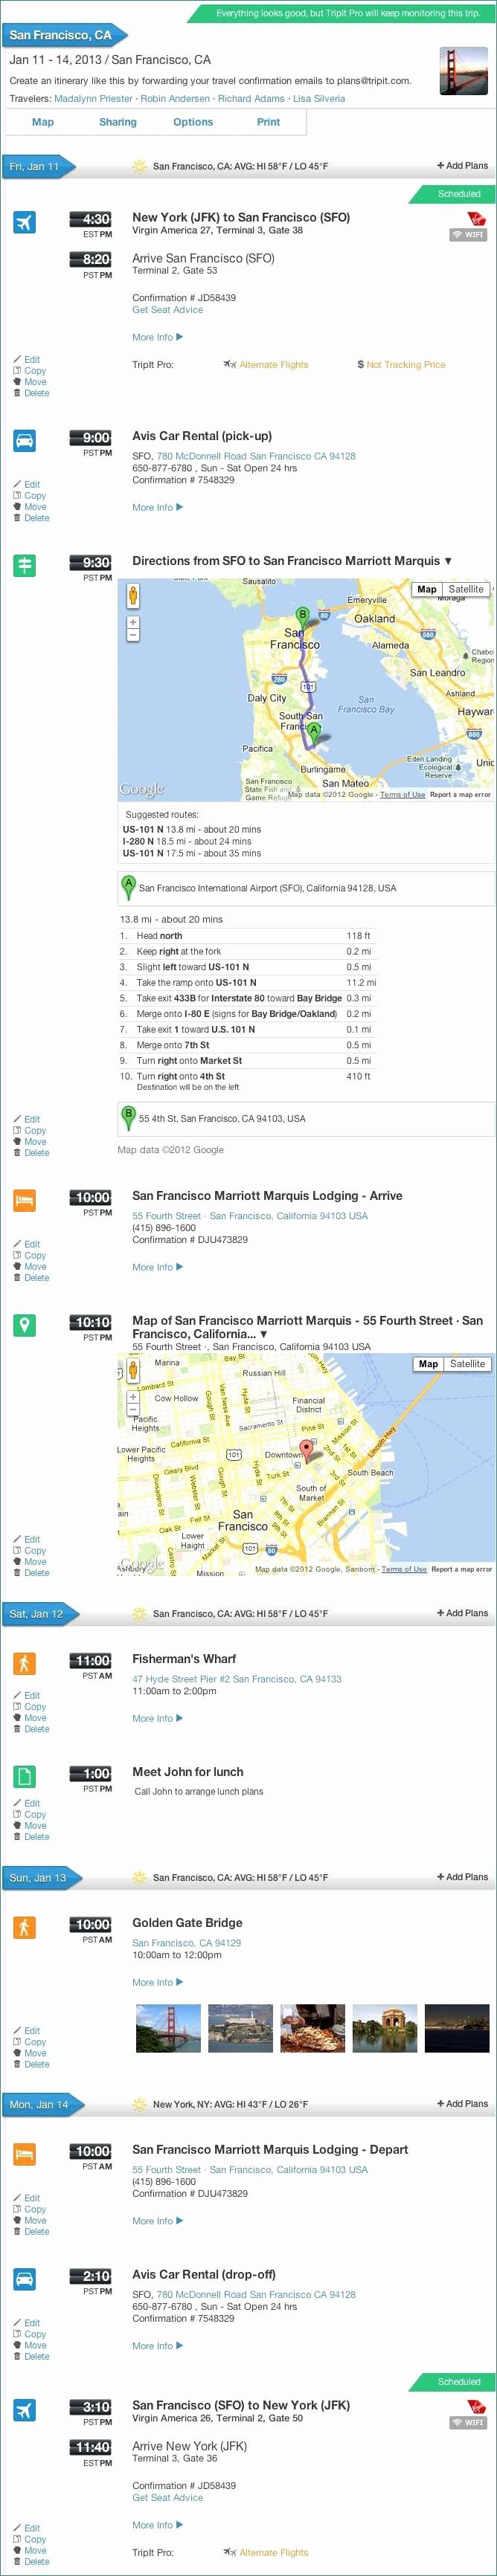 Travel Itinerary Template Google Docs Elegant Travel Itinerary Template Google Docs Magnificent Google